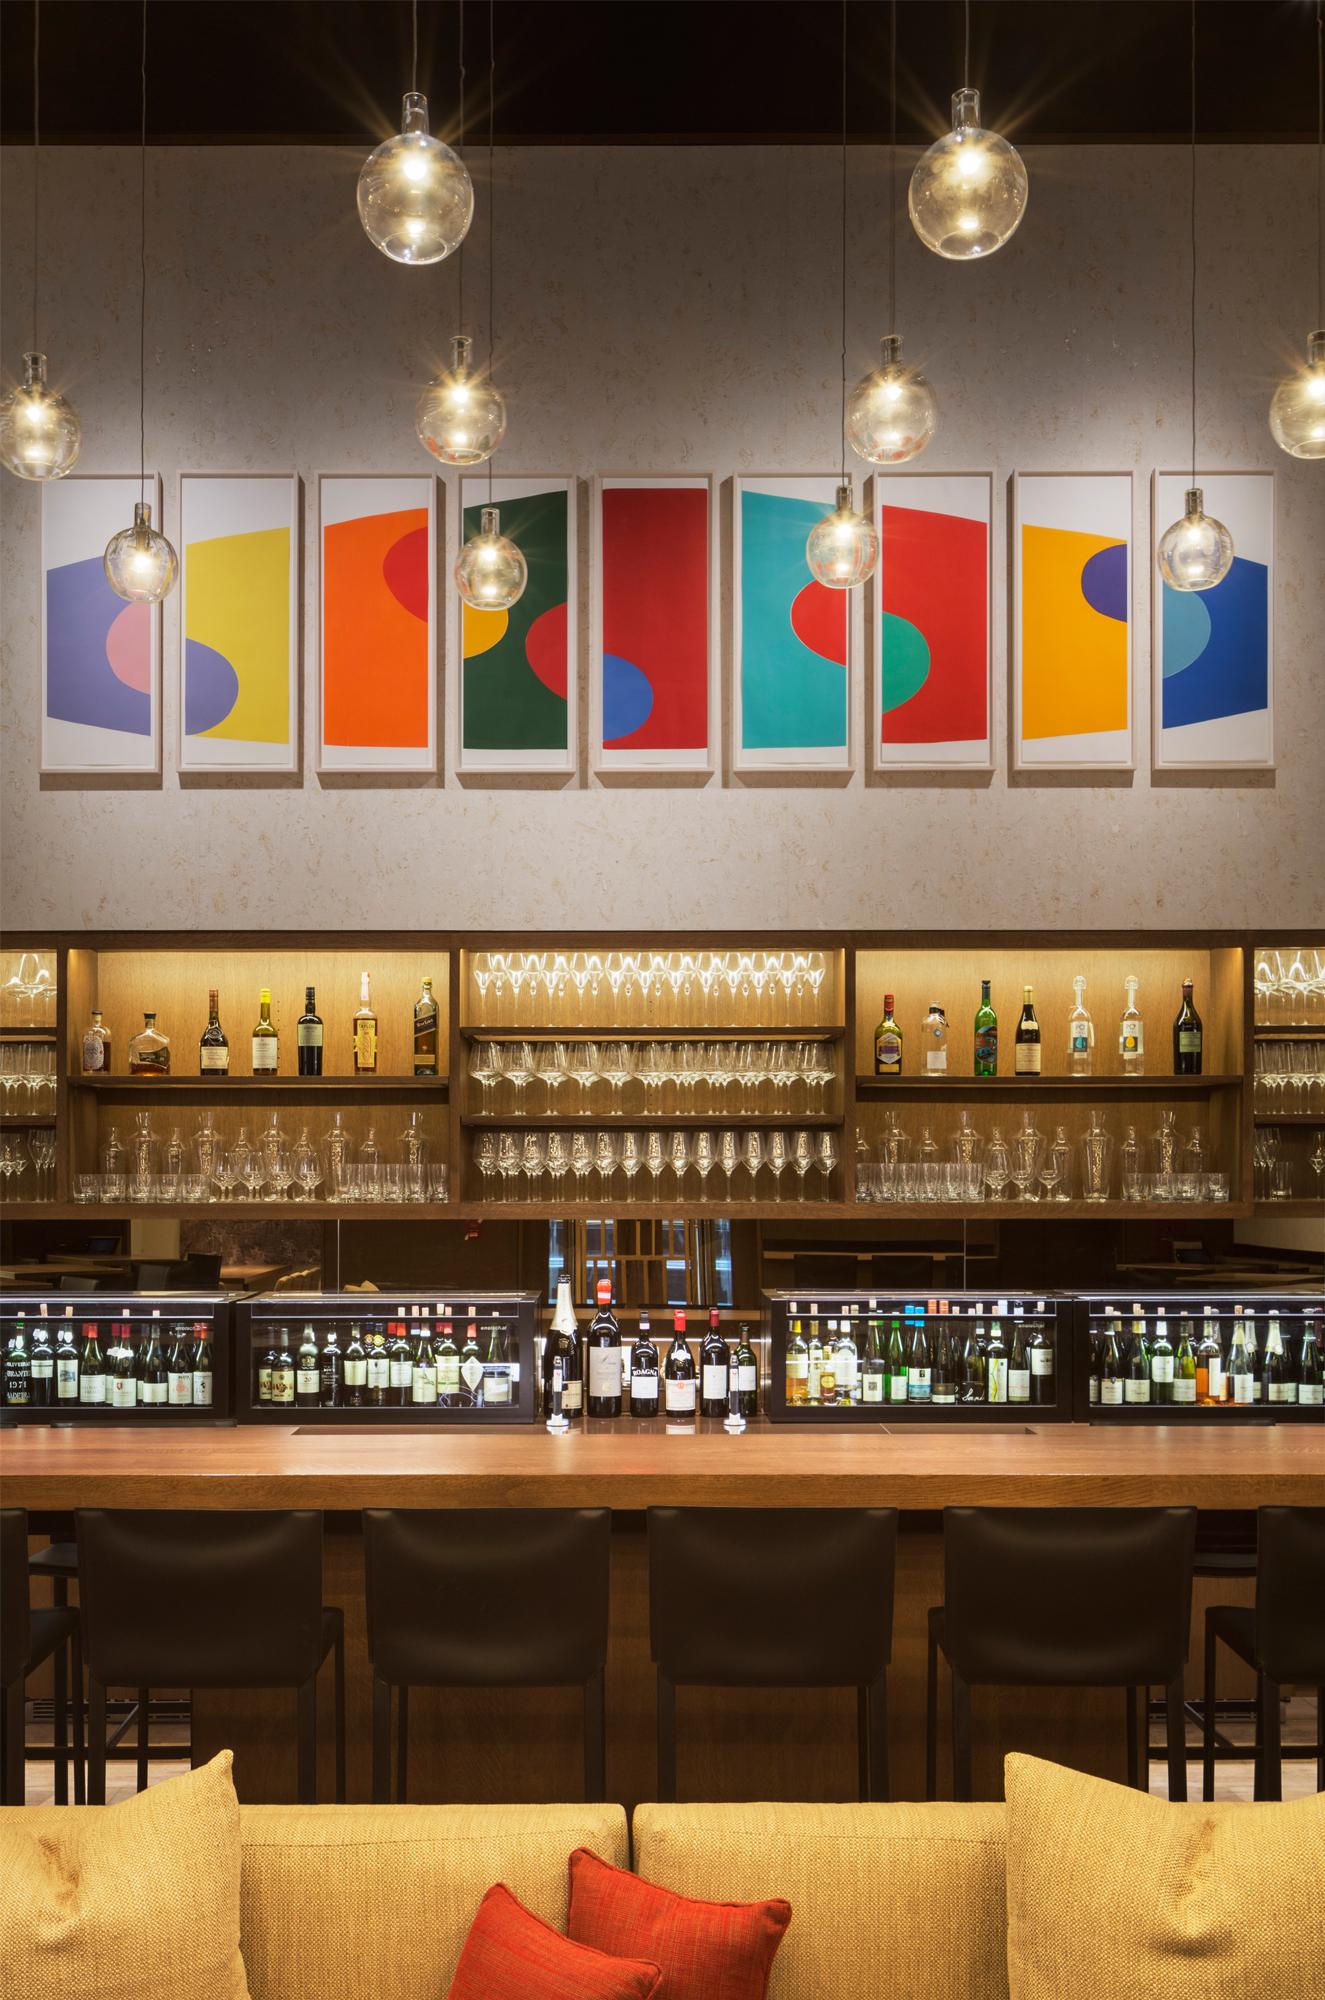 kitchen planners white tile aldo sohm wine bar | bentel & architects/planners a ...